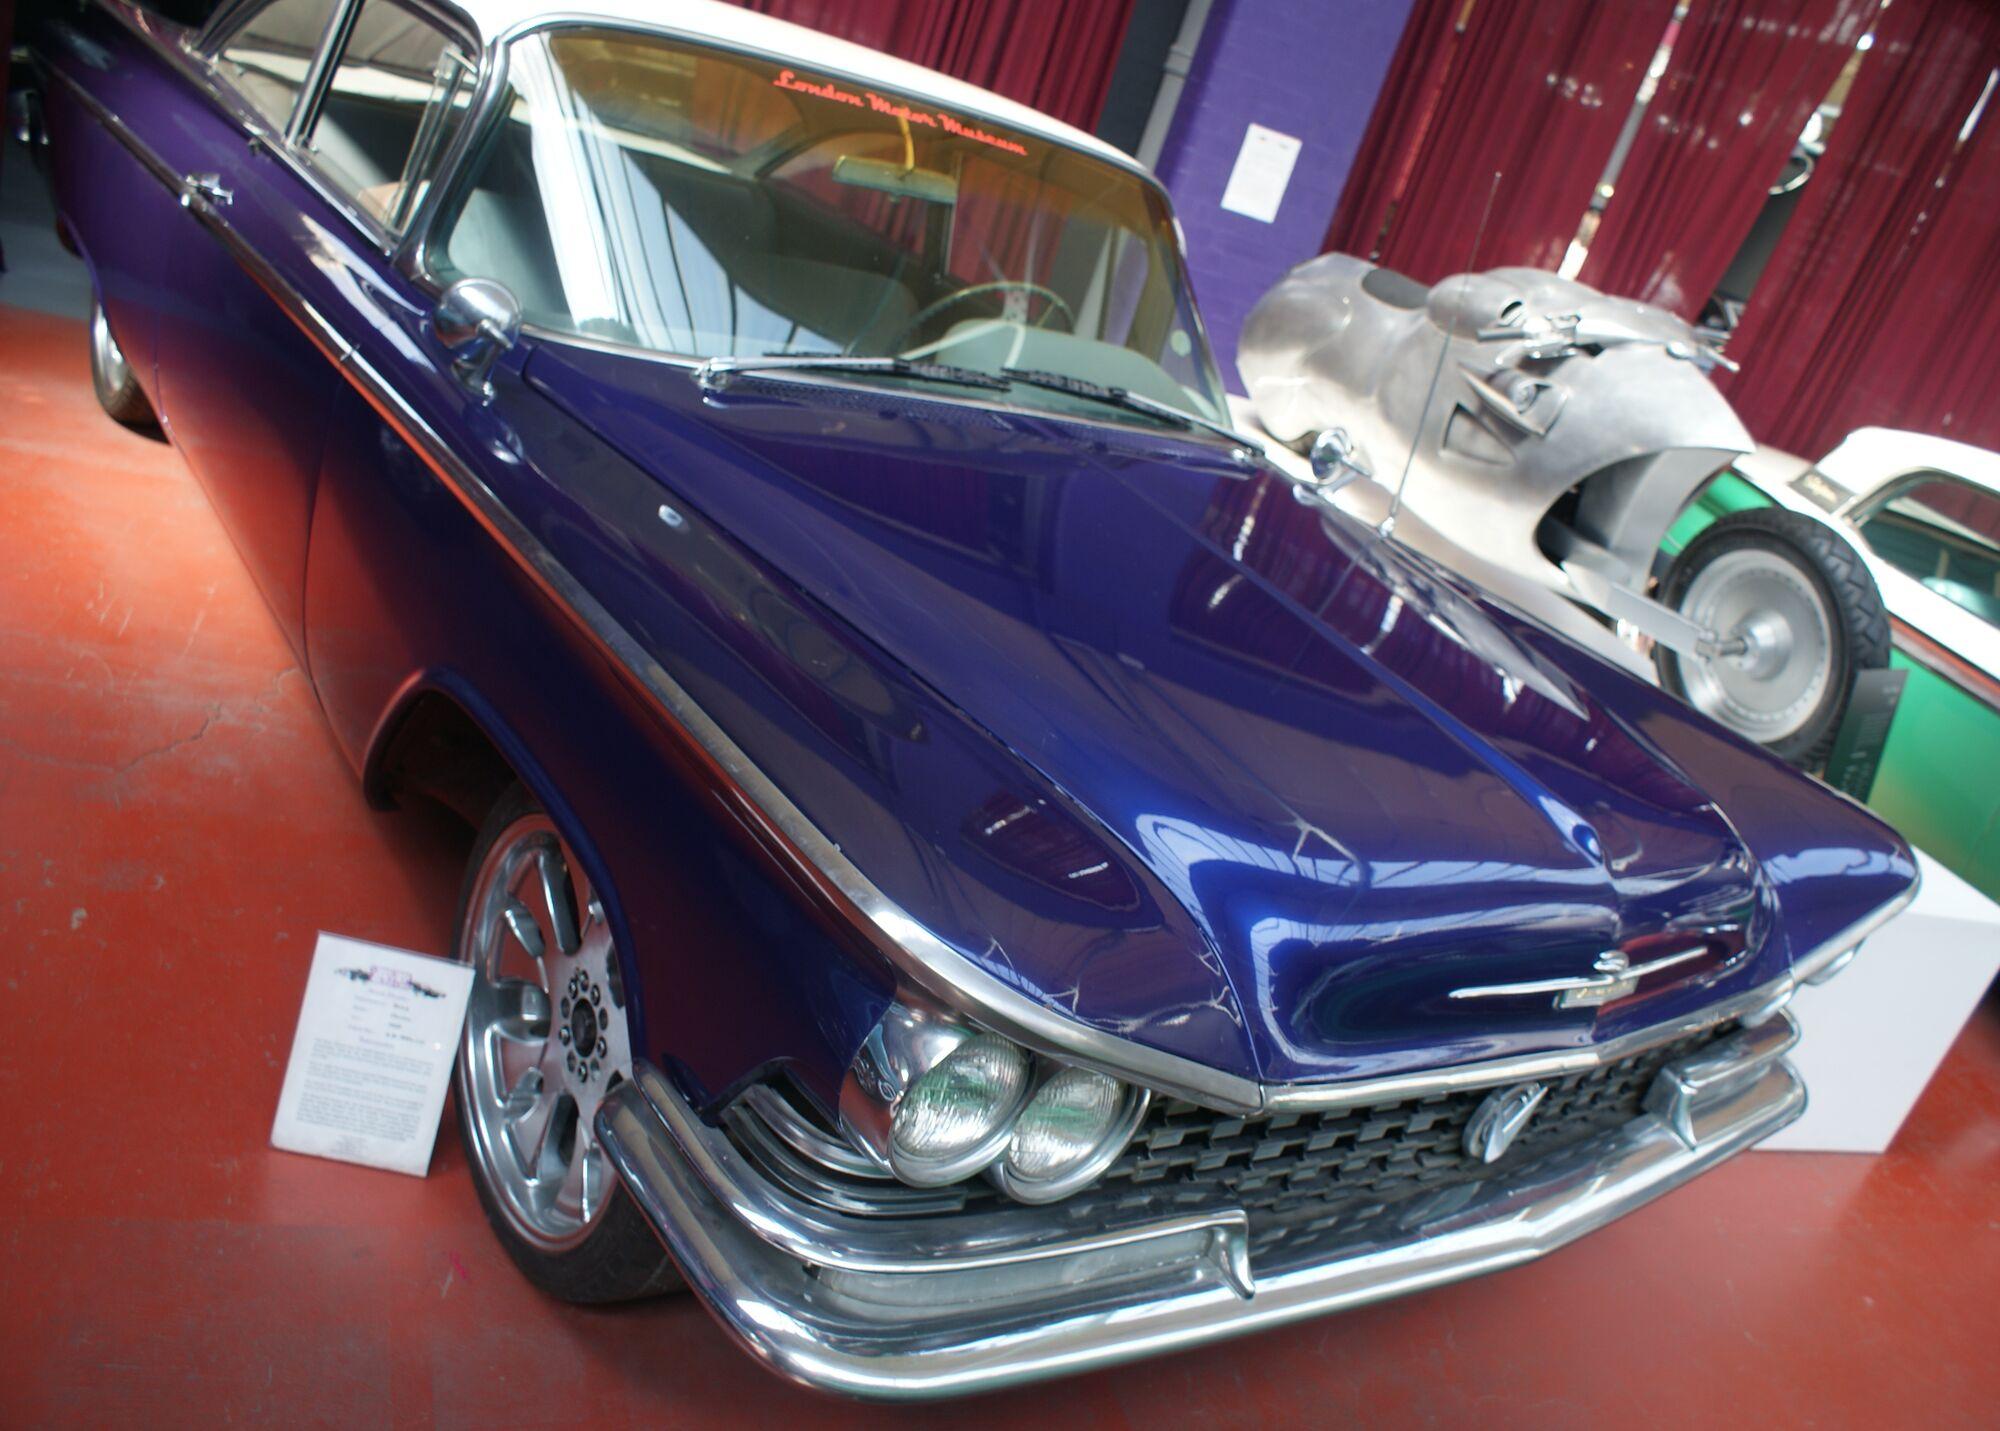 Buick Electra Classic Cars Wiki Fandom Powered By Wikia